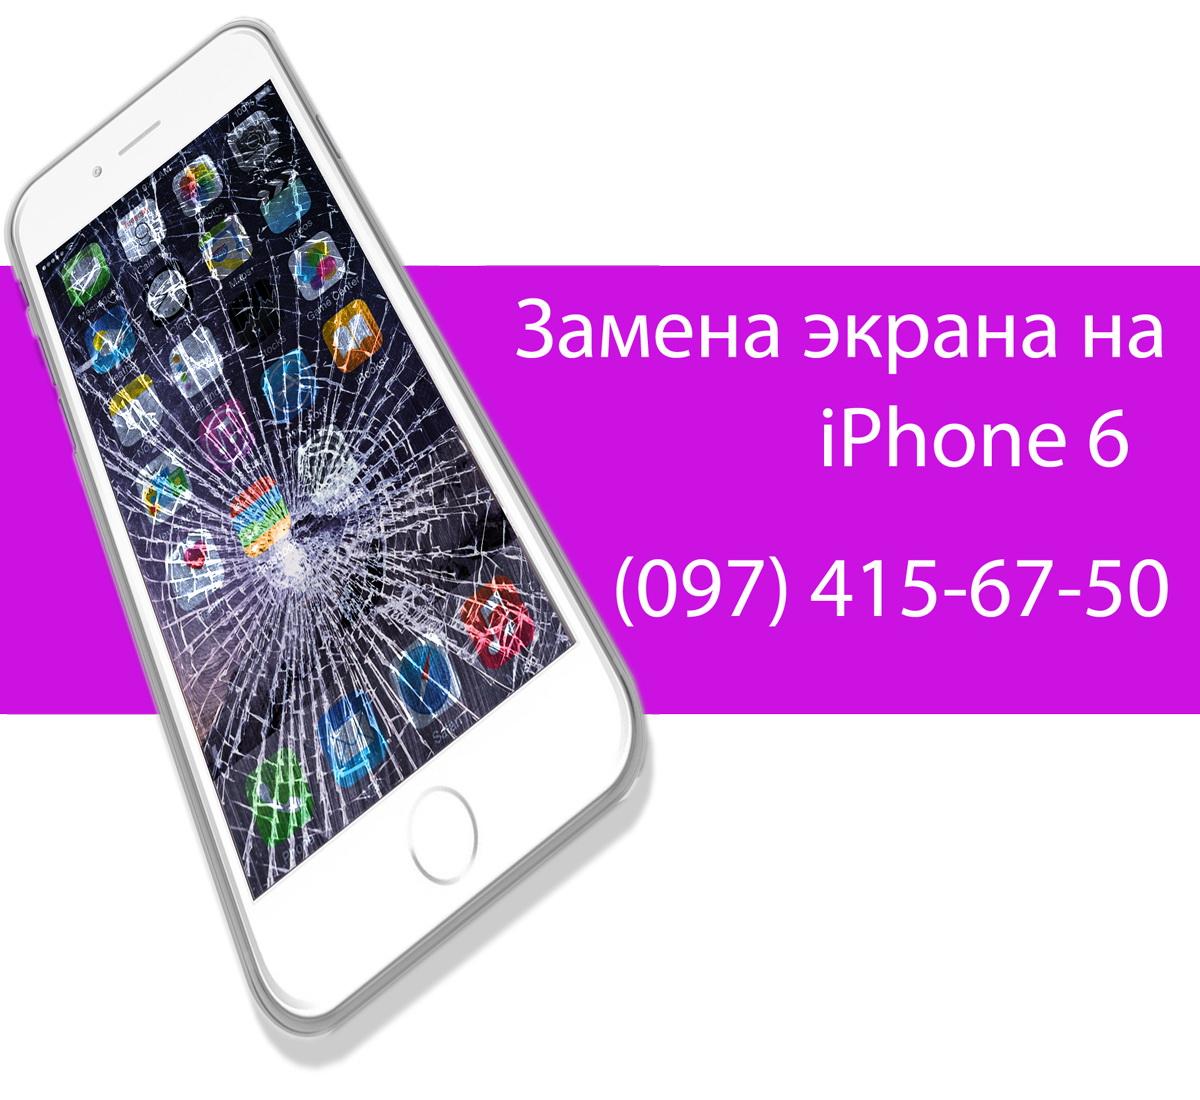 Замена экрана и стекла для iPhone 6